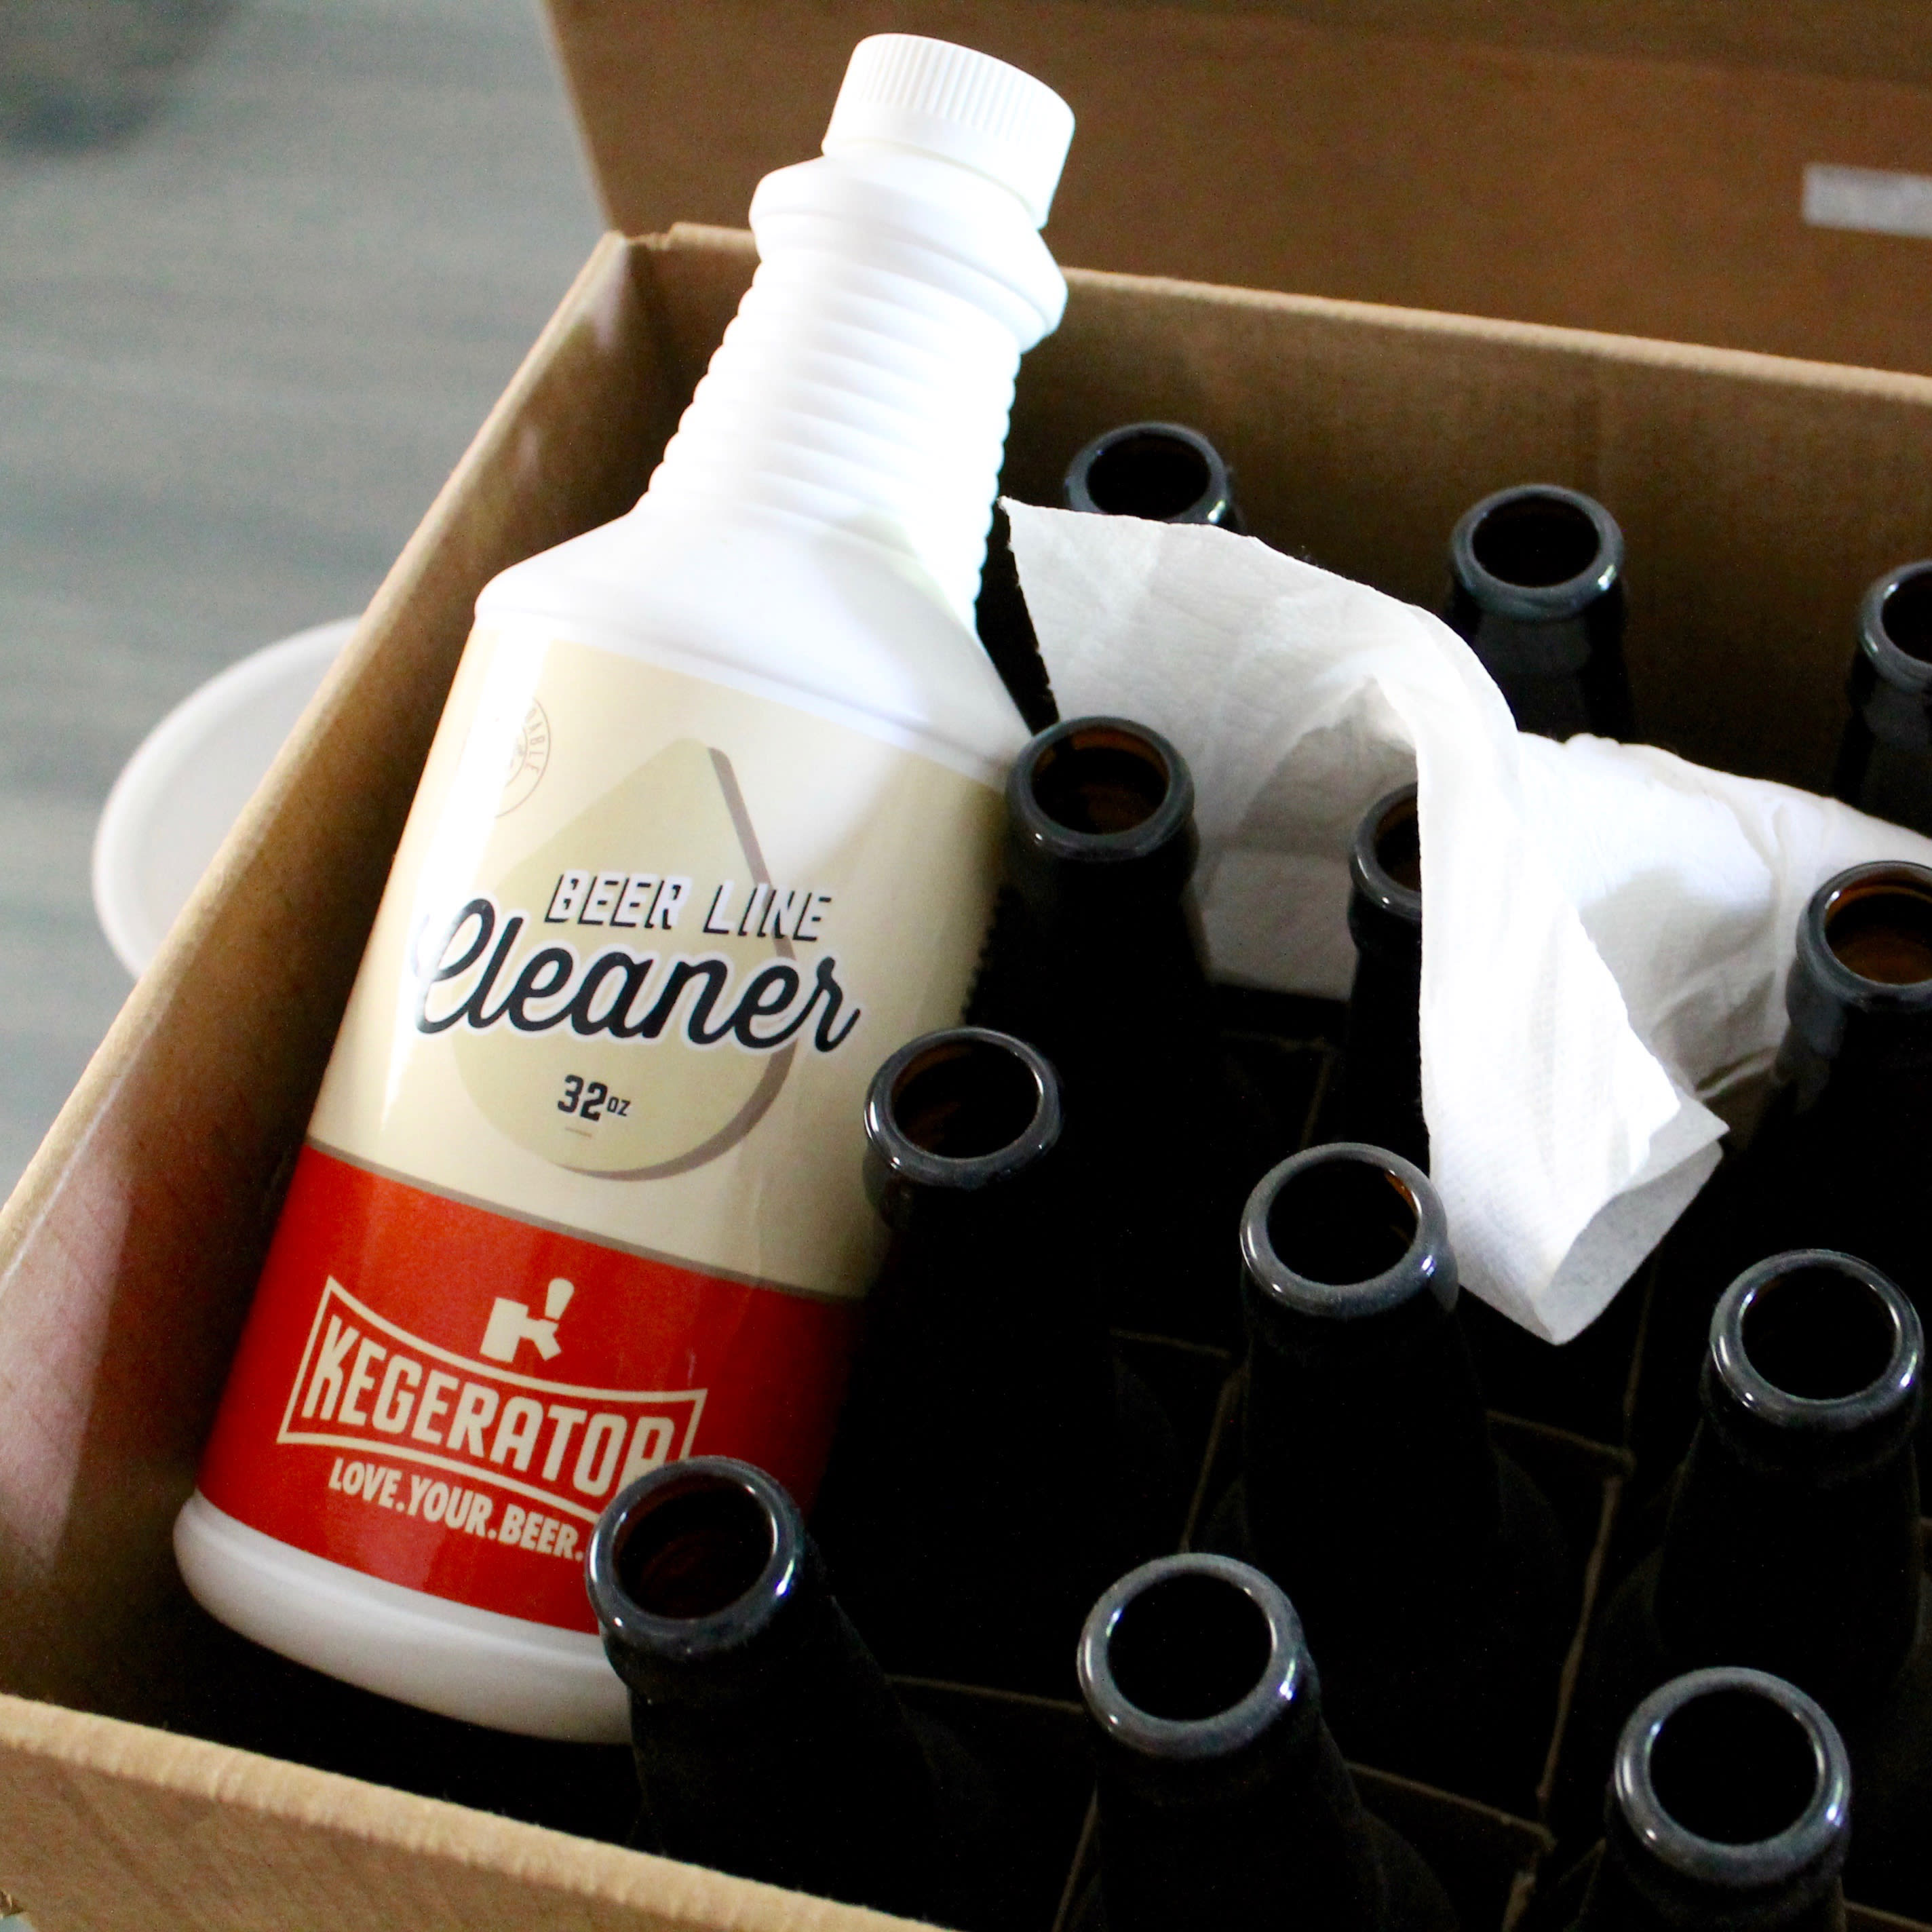 Kegerators, Beer Coolers, Kegs & Dispensers :: Kegerator.com